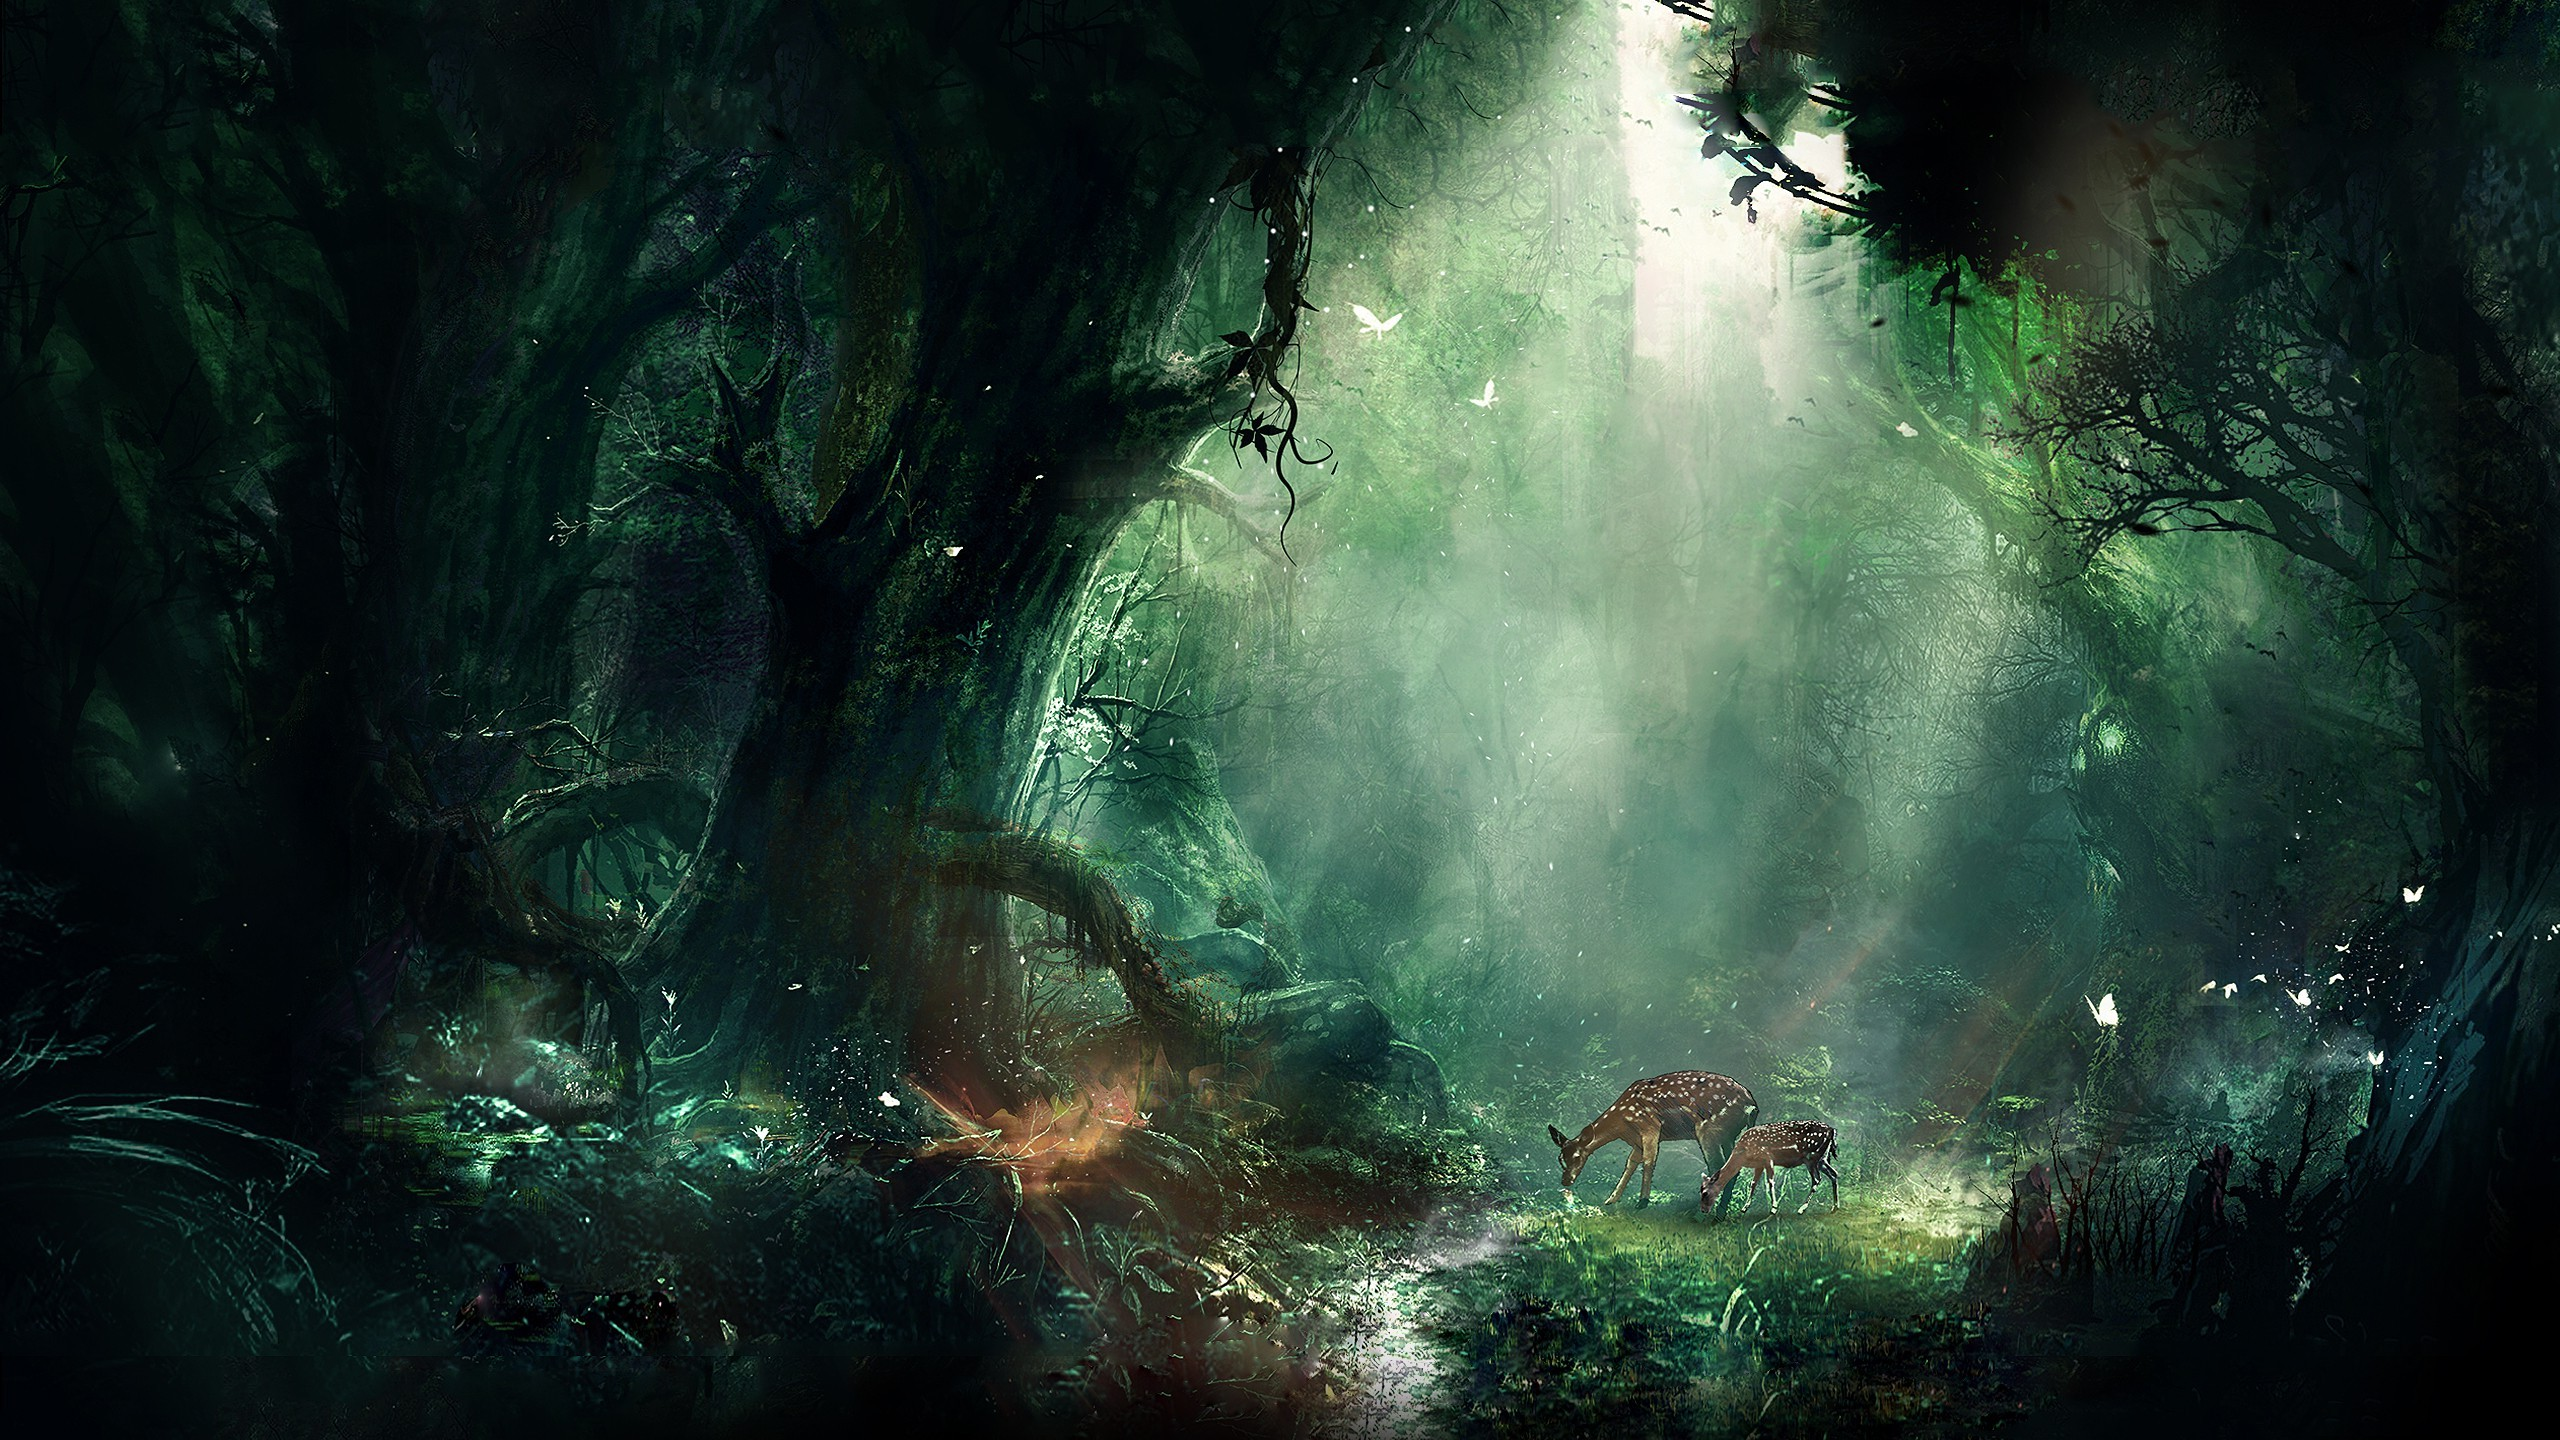 Digital Art Nature Wallpaper 2560 X 1440 By Fay0773813636 On Deviantart